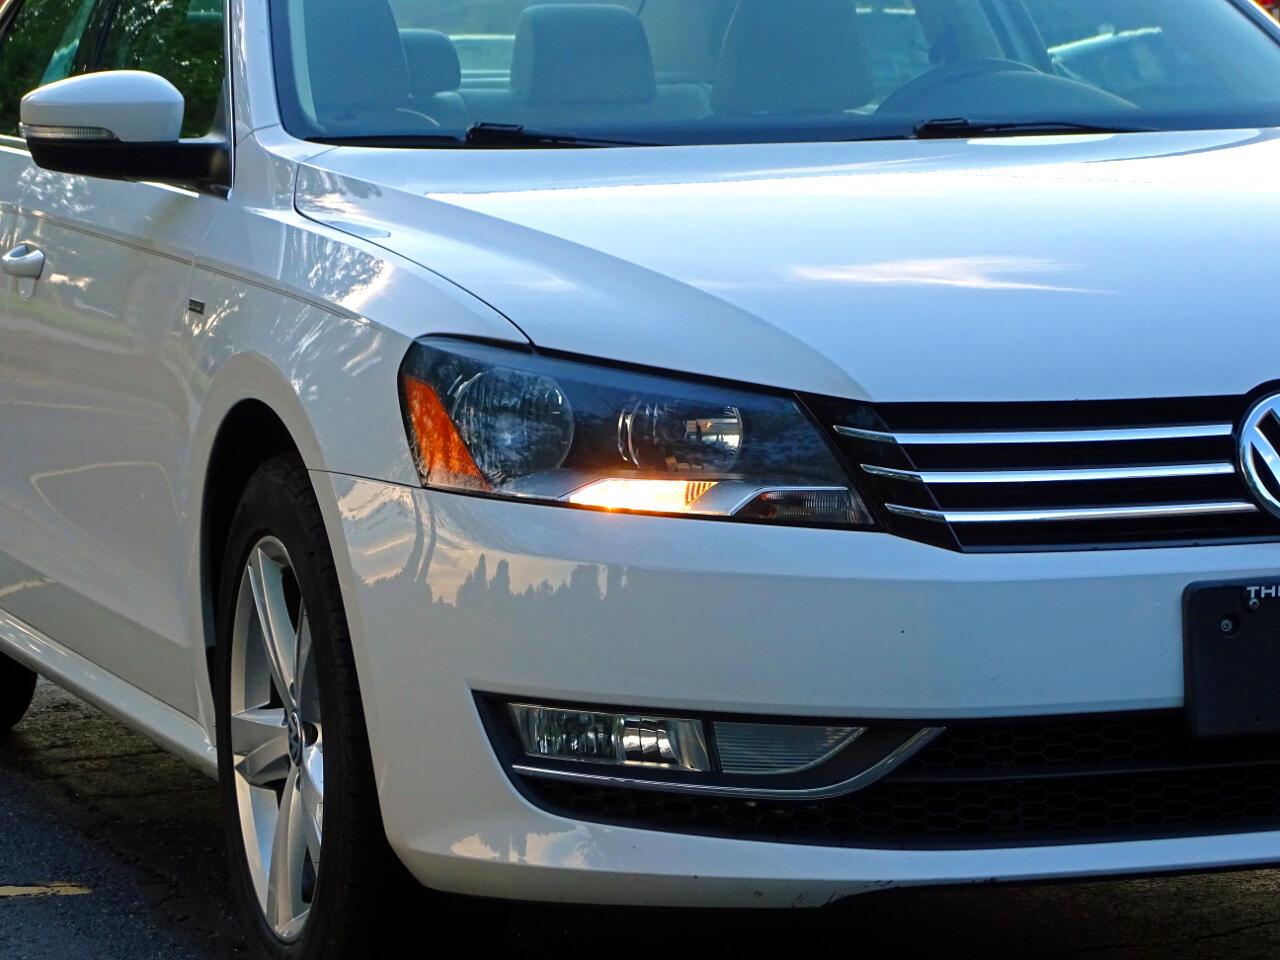 2015 Volkswagen Passat 4dr Sdn 1.8T Auto Limited Edition